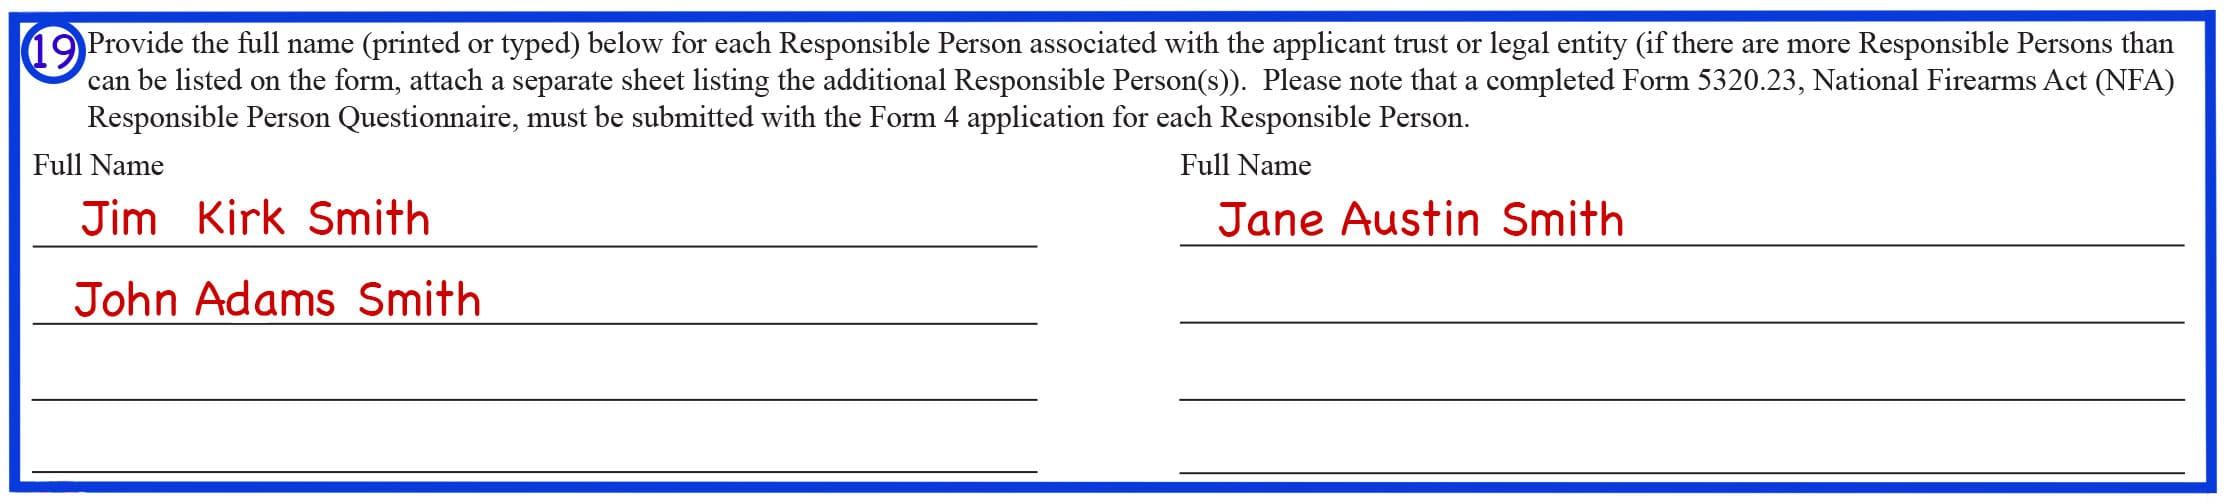 Form 4 Box 19